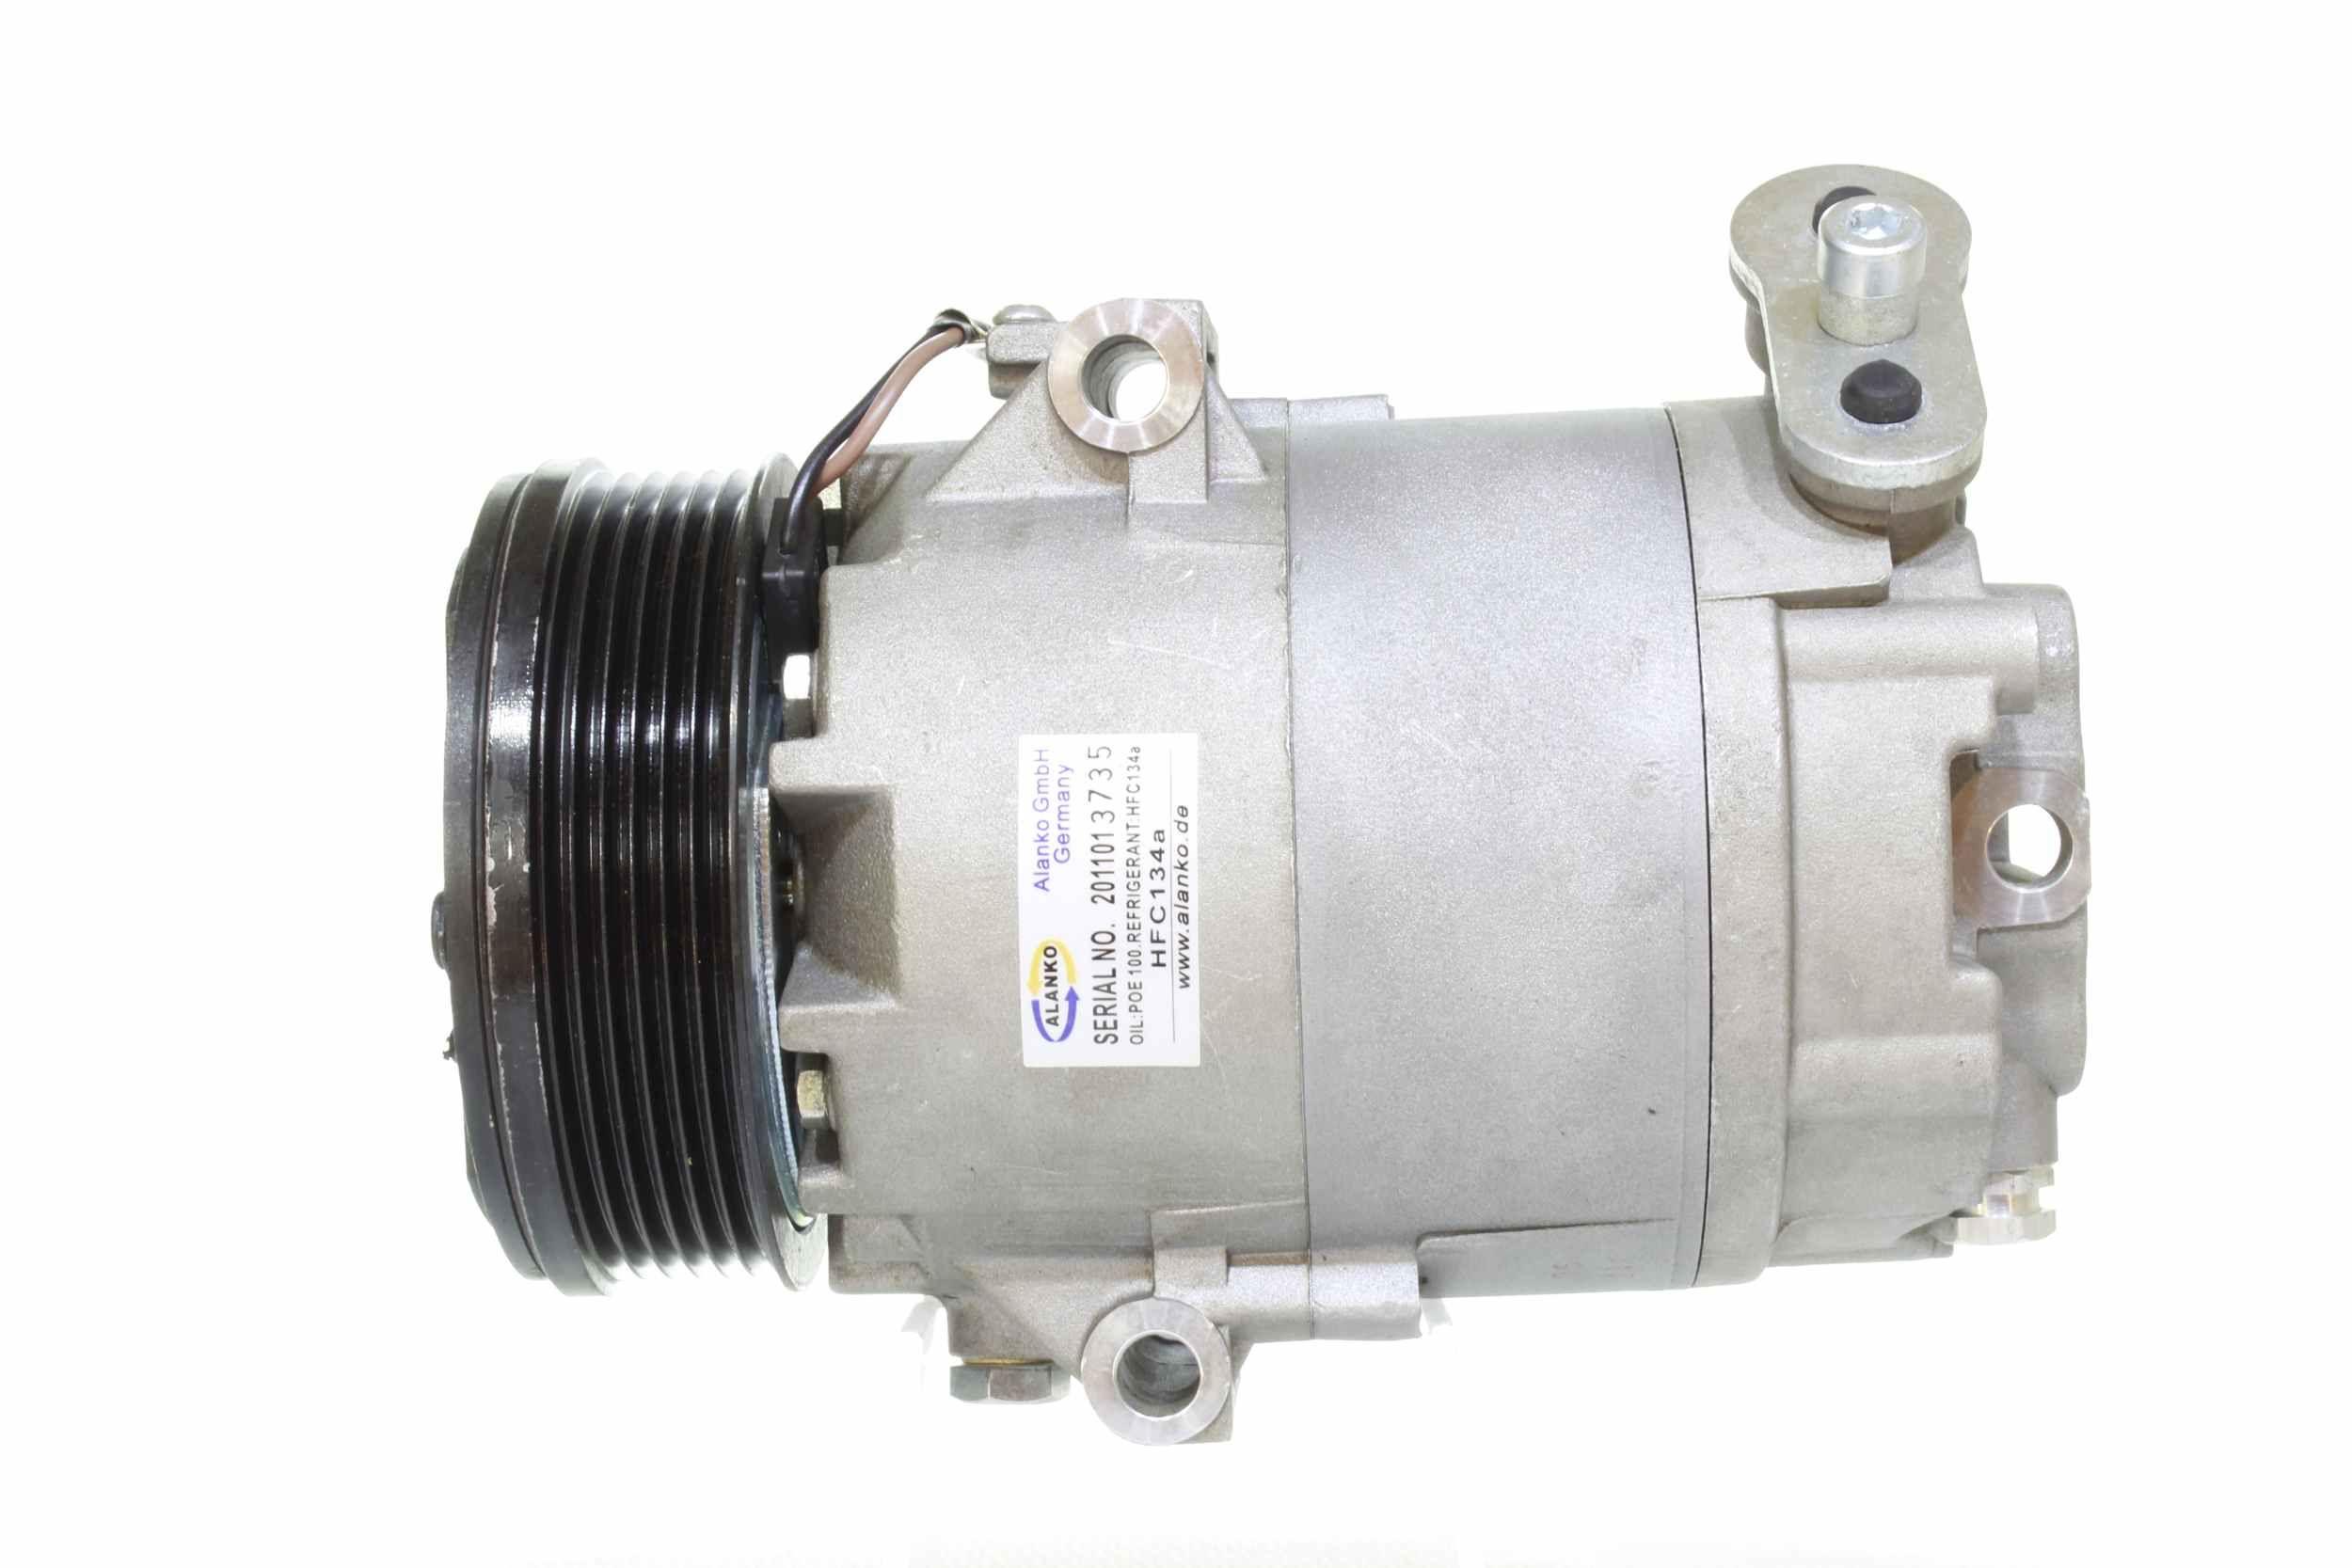 Kompressor Klimaanlage ALANKO 10550072